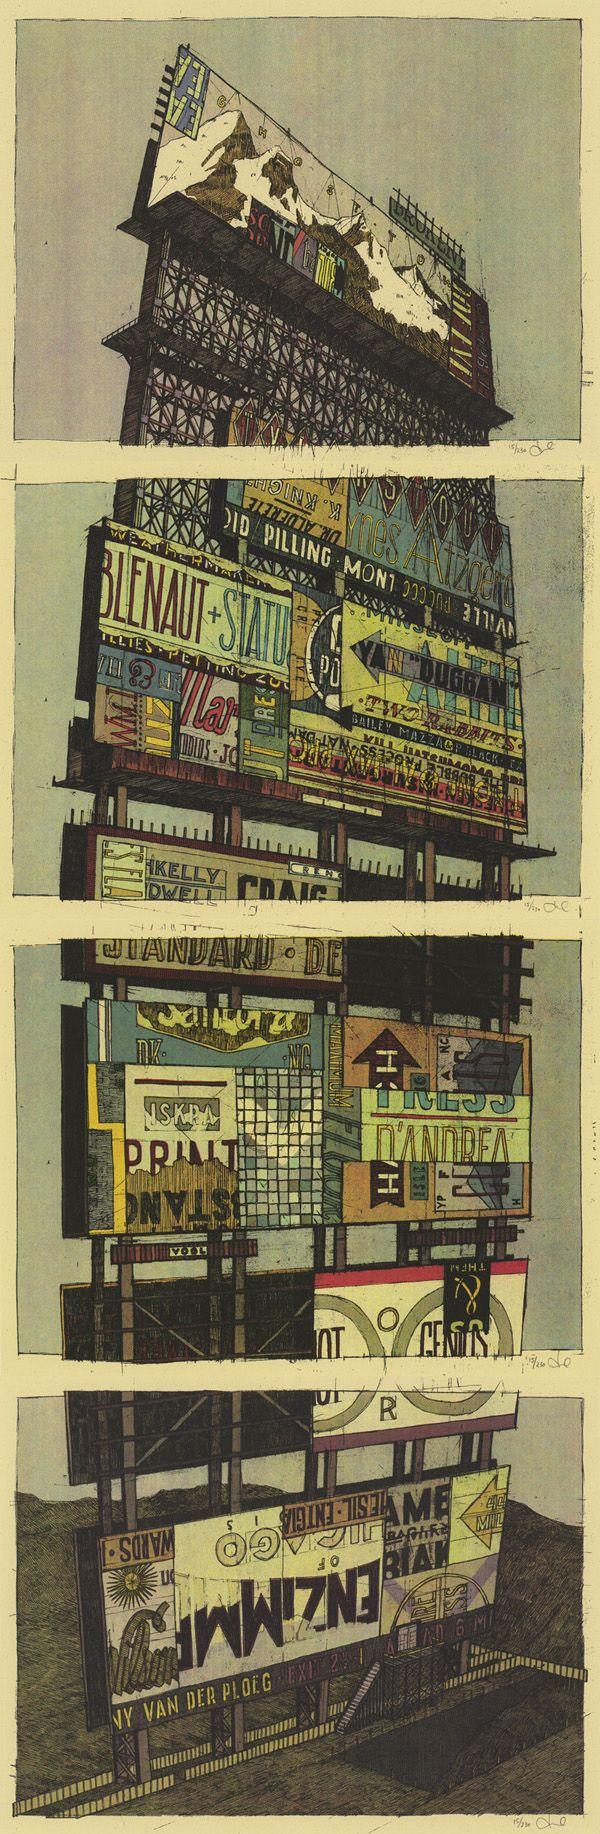 D d poster design - Incredible Gig Poster By Landland